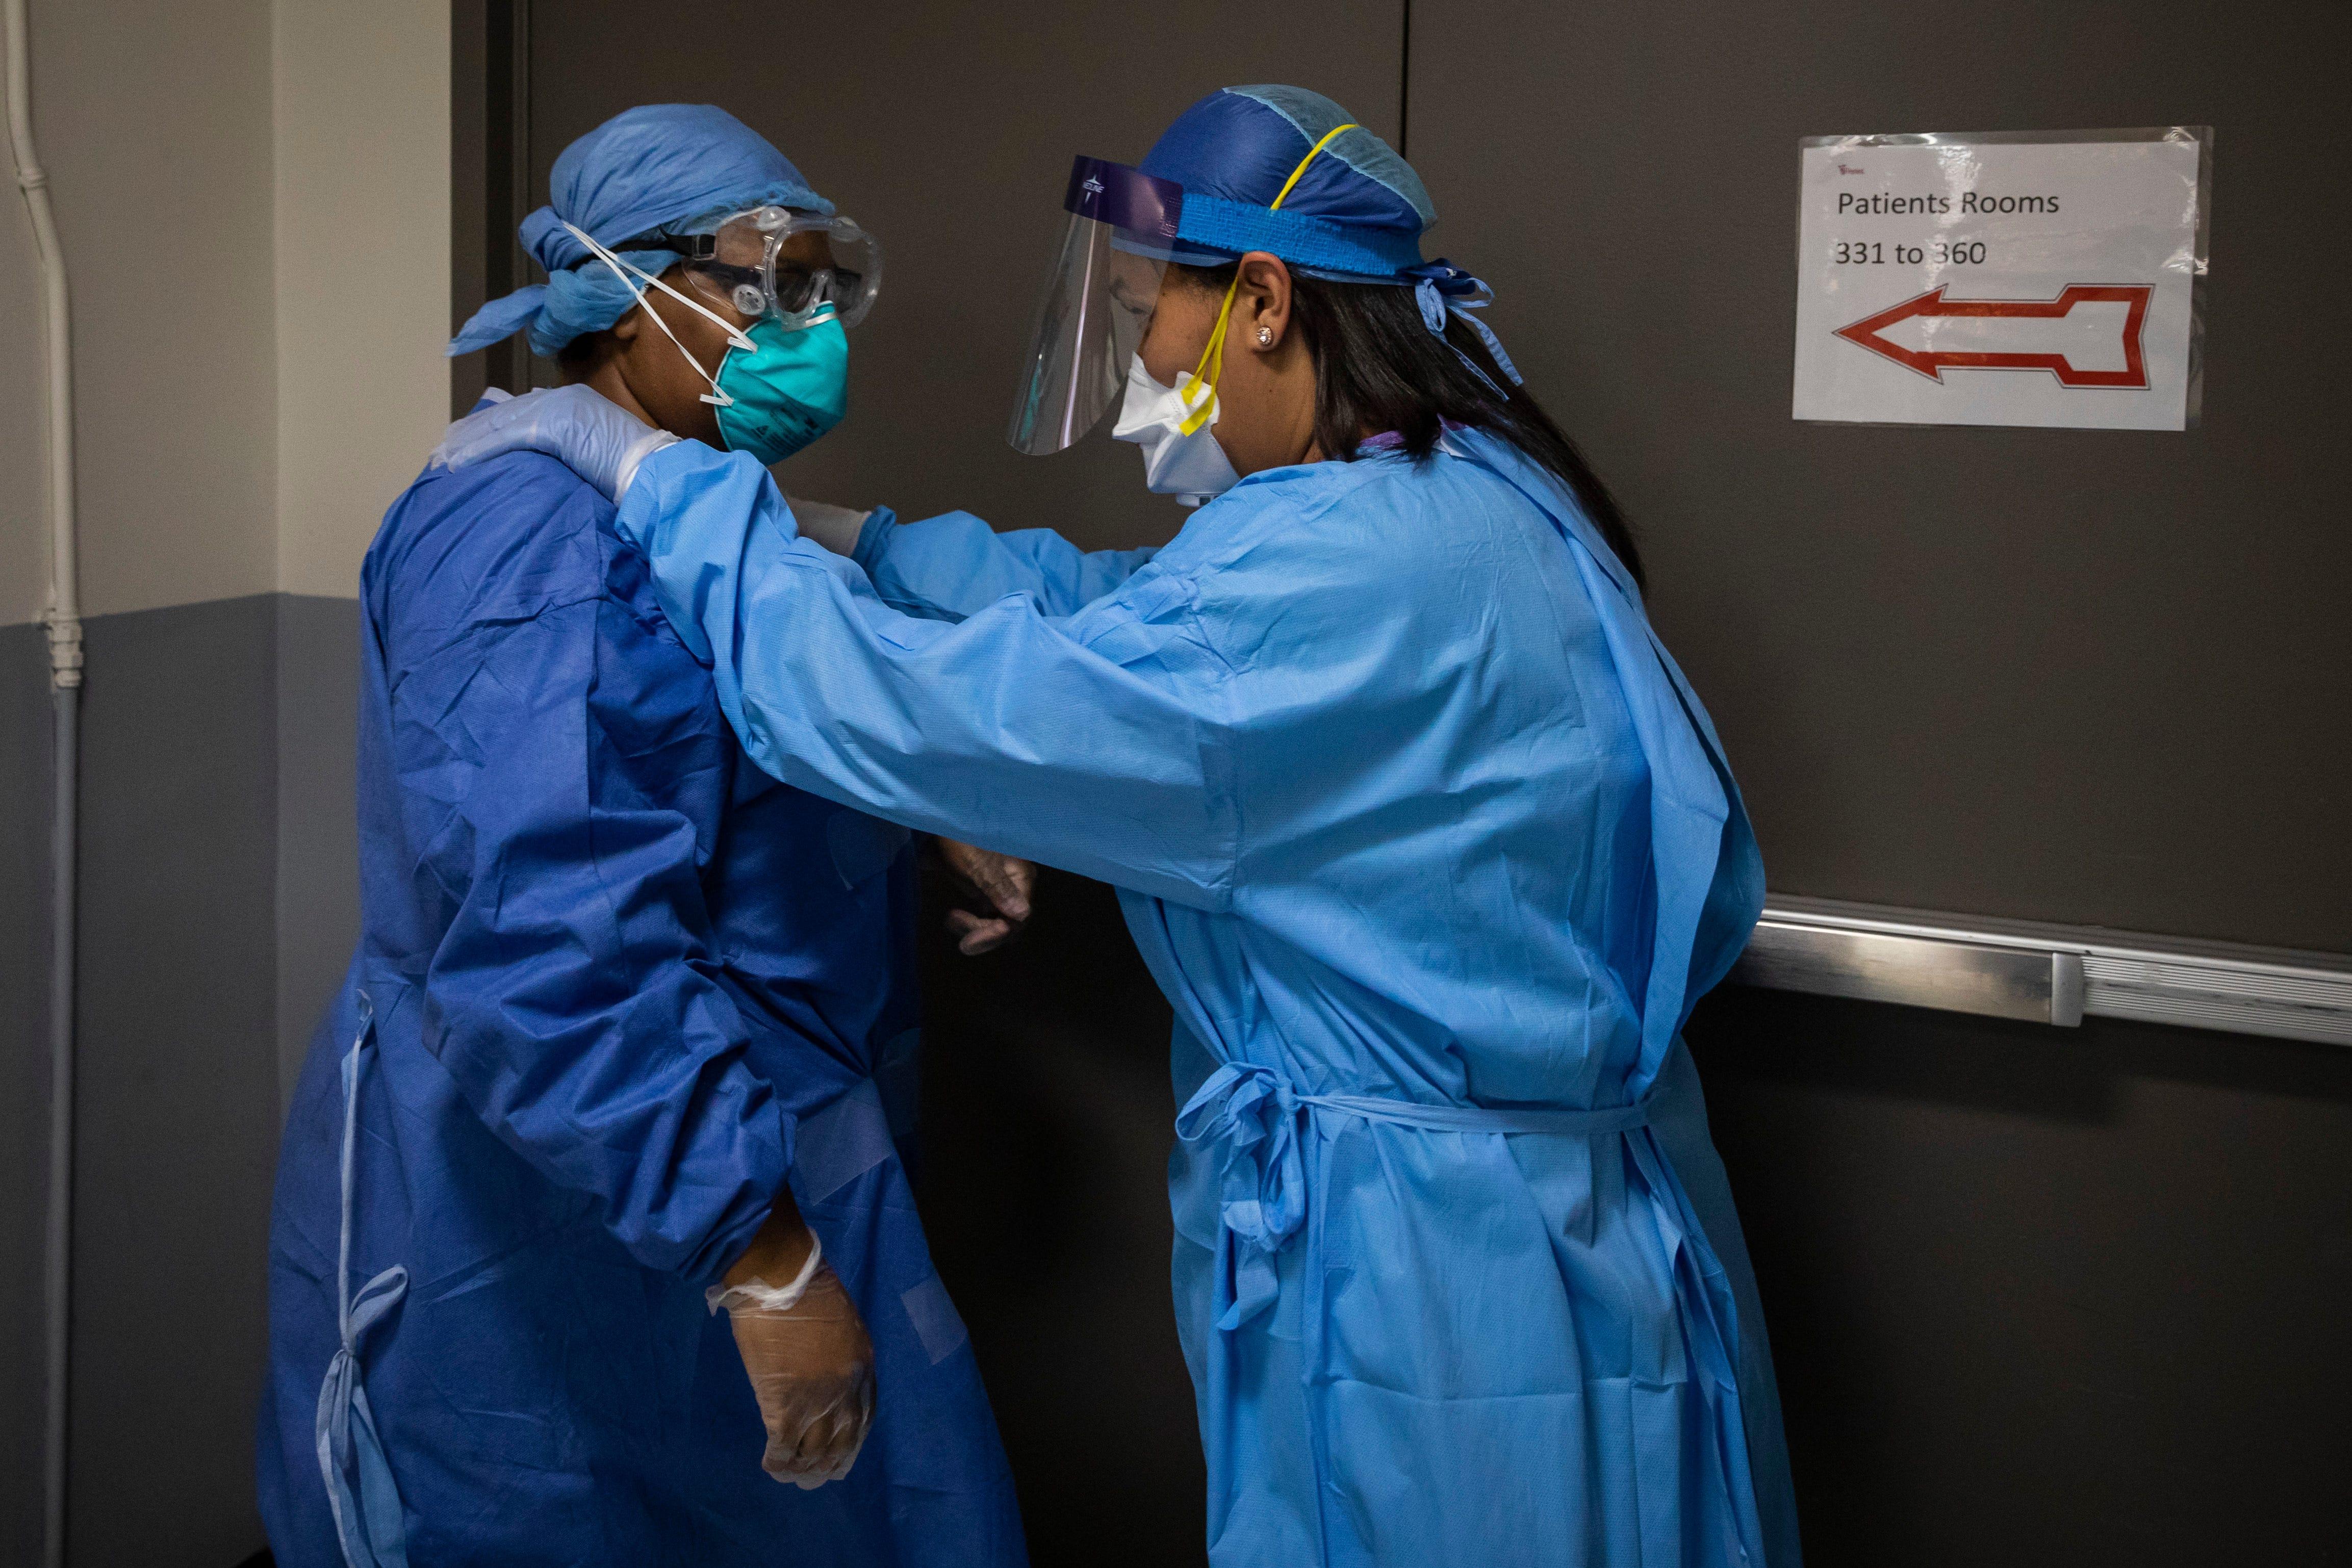 Coronavirus Death Count Has Doctors Struggling With Mental Health